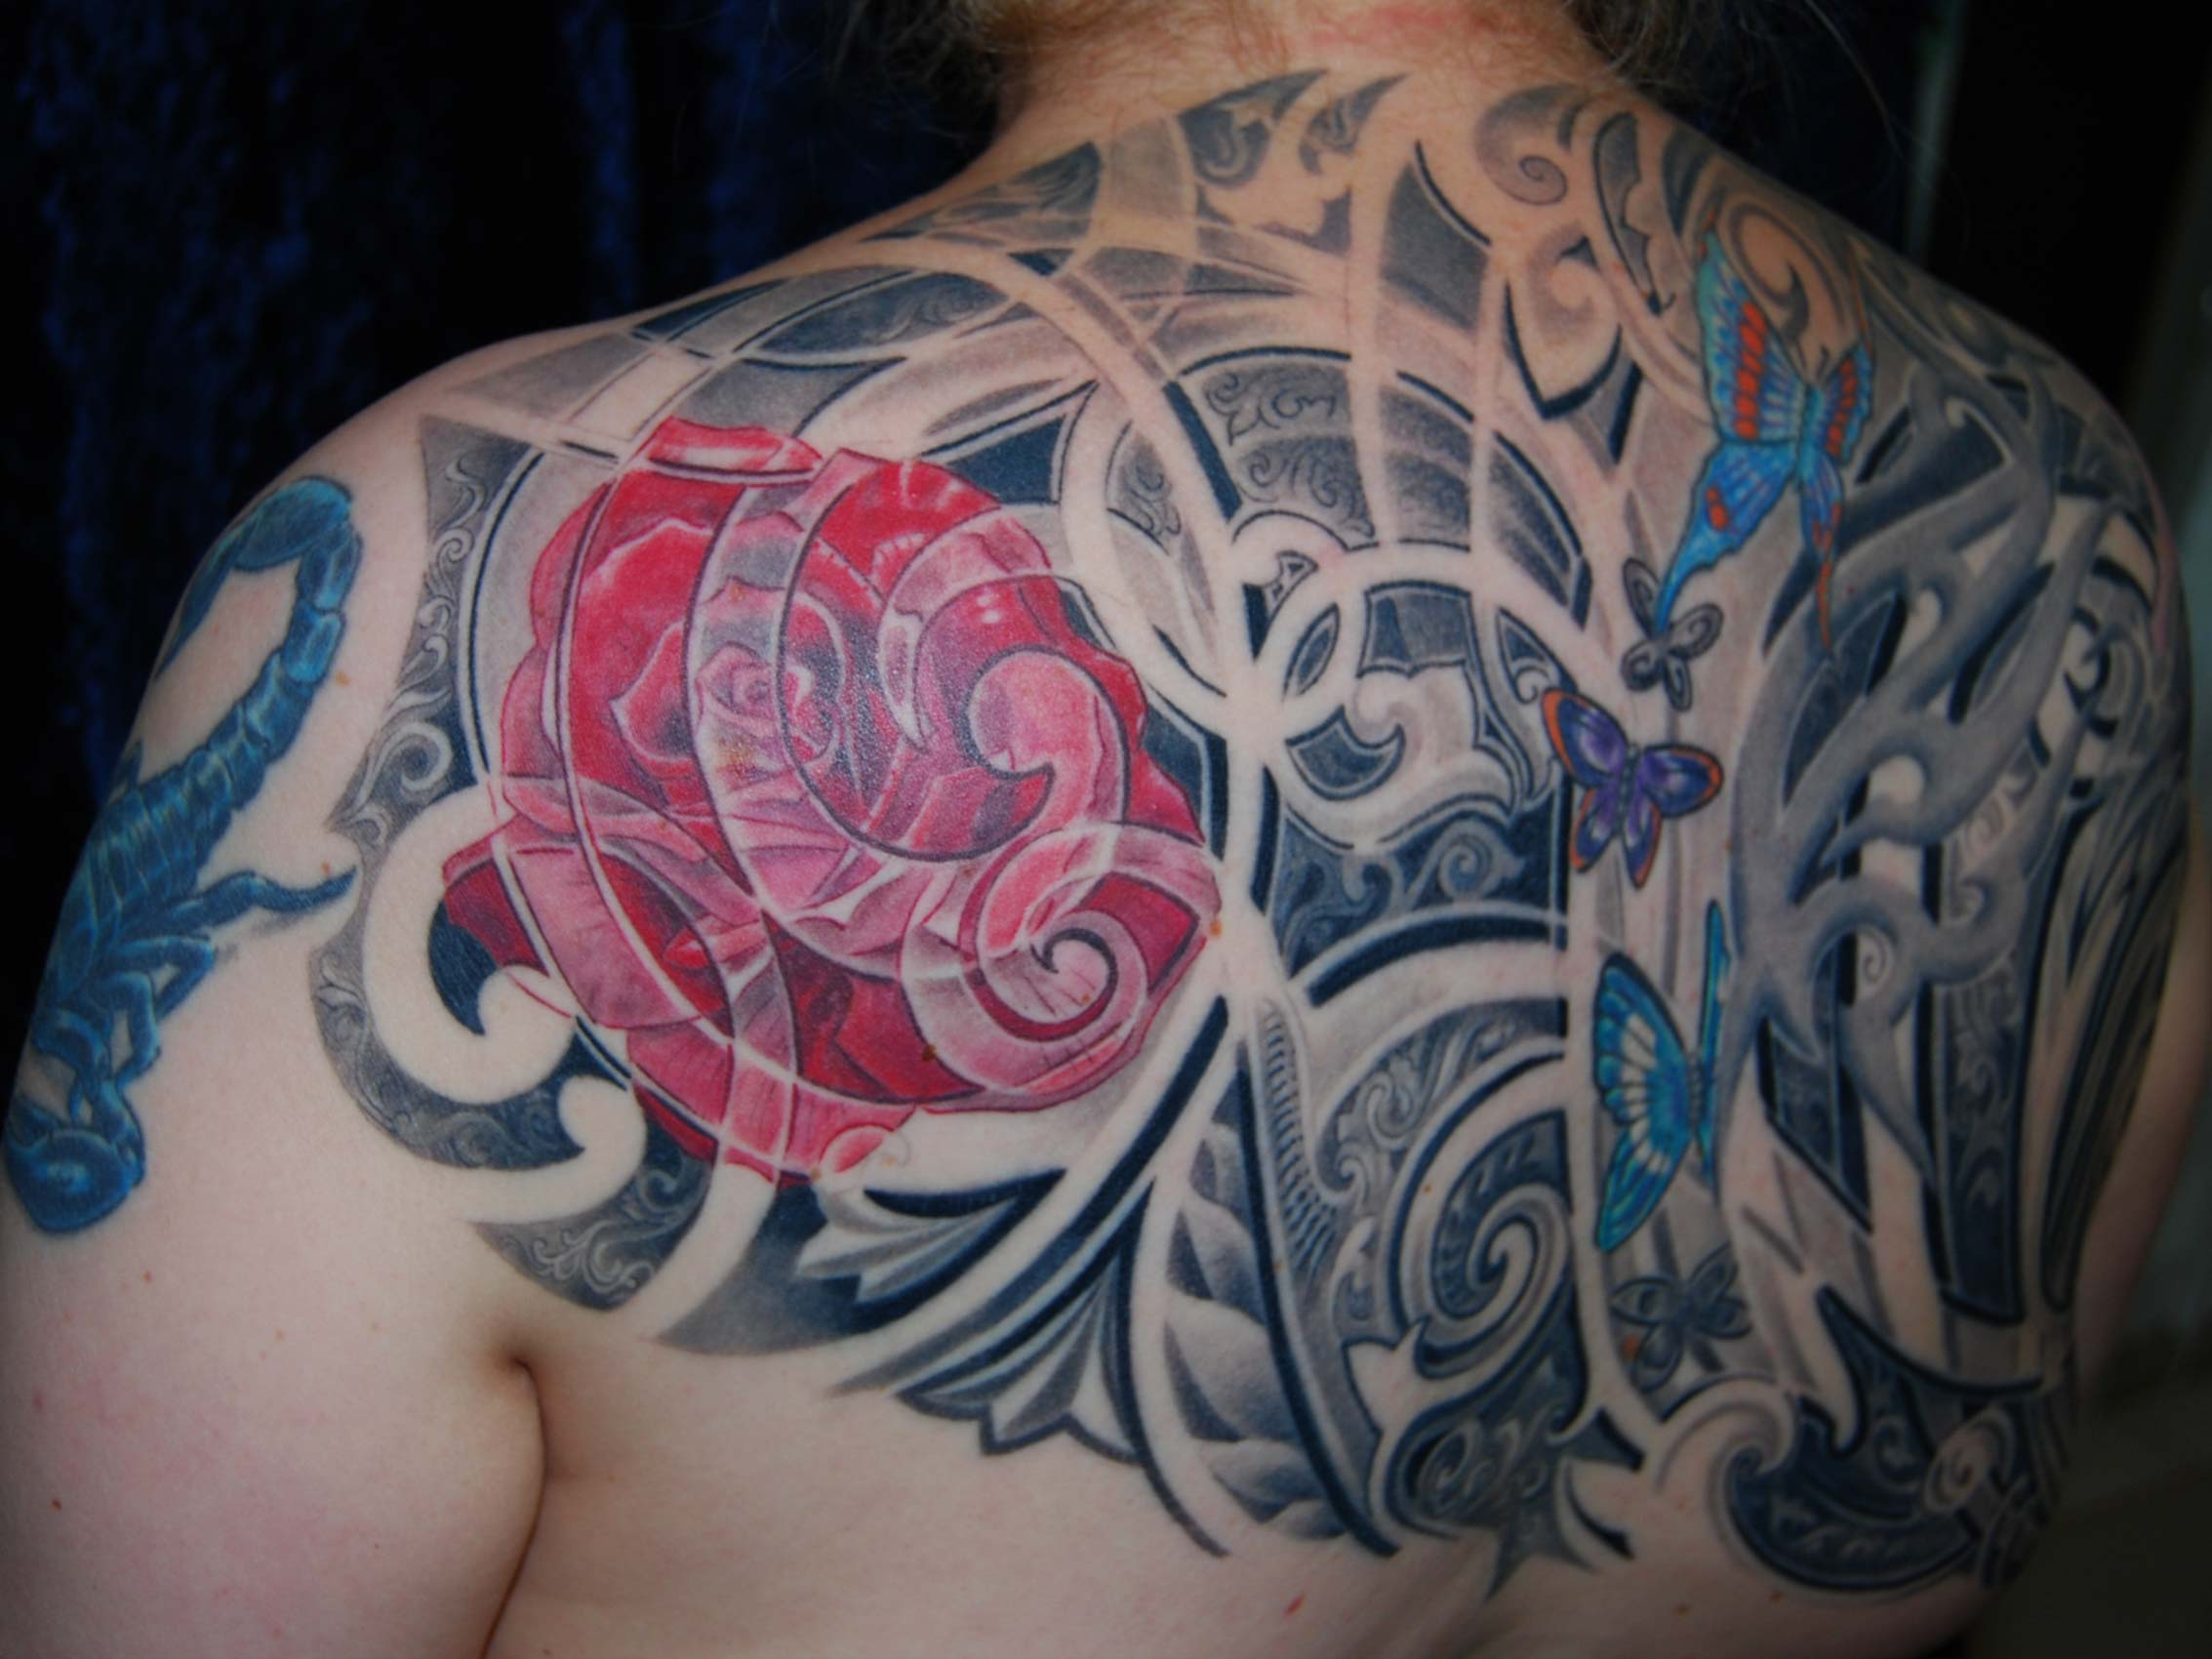 Ornament-Tribal-Floral-Schmetterling-Blumen-Backpiece-Tattoo-Muenchen